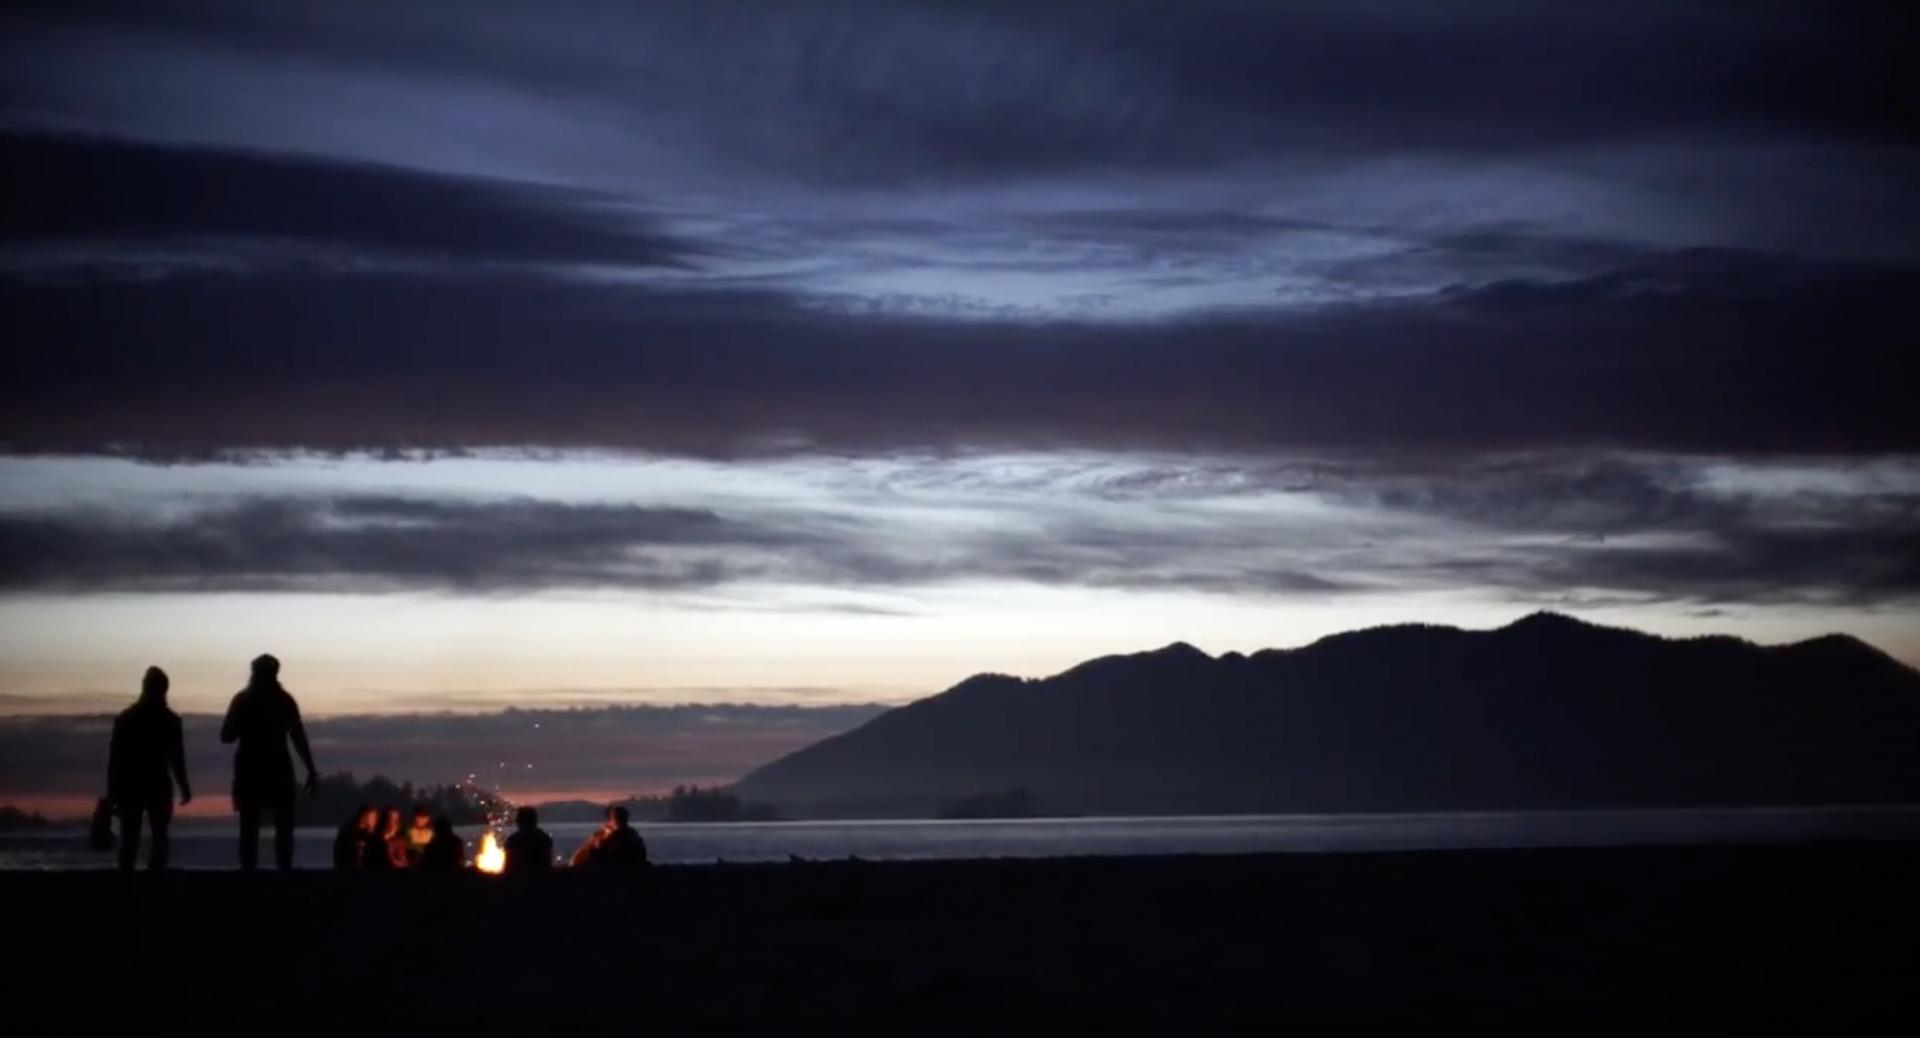 campfire-fire-night-coast-east